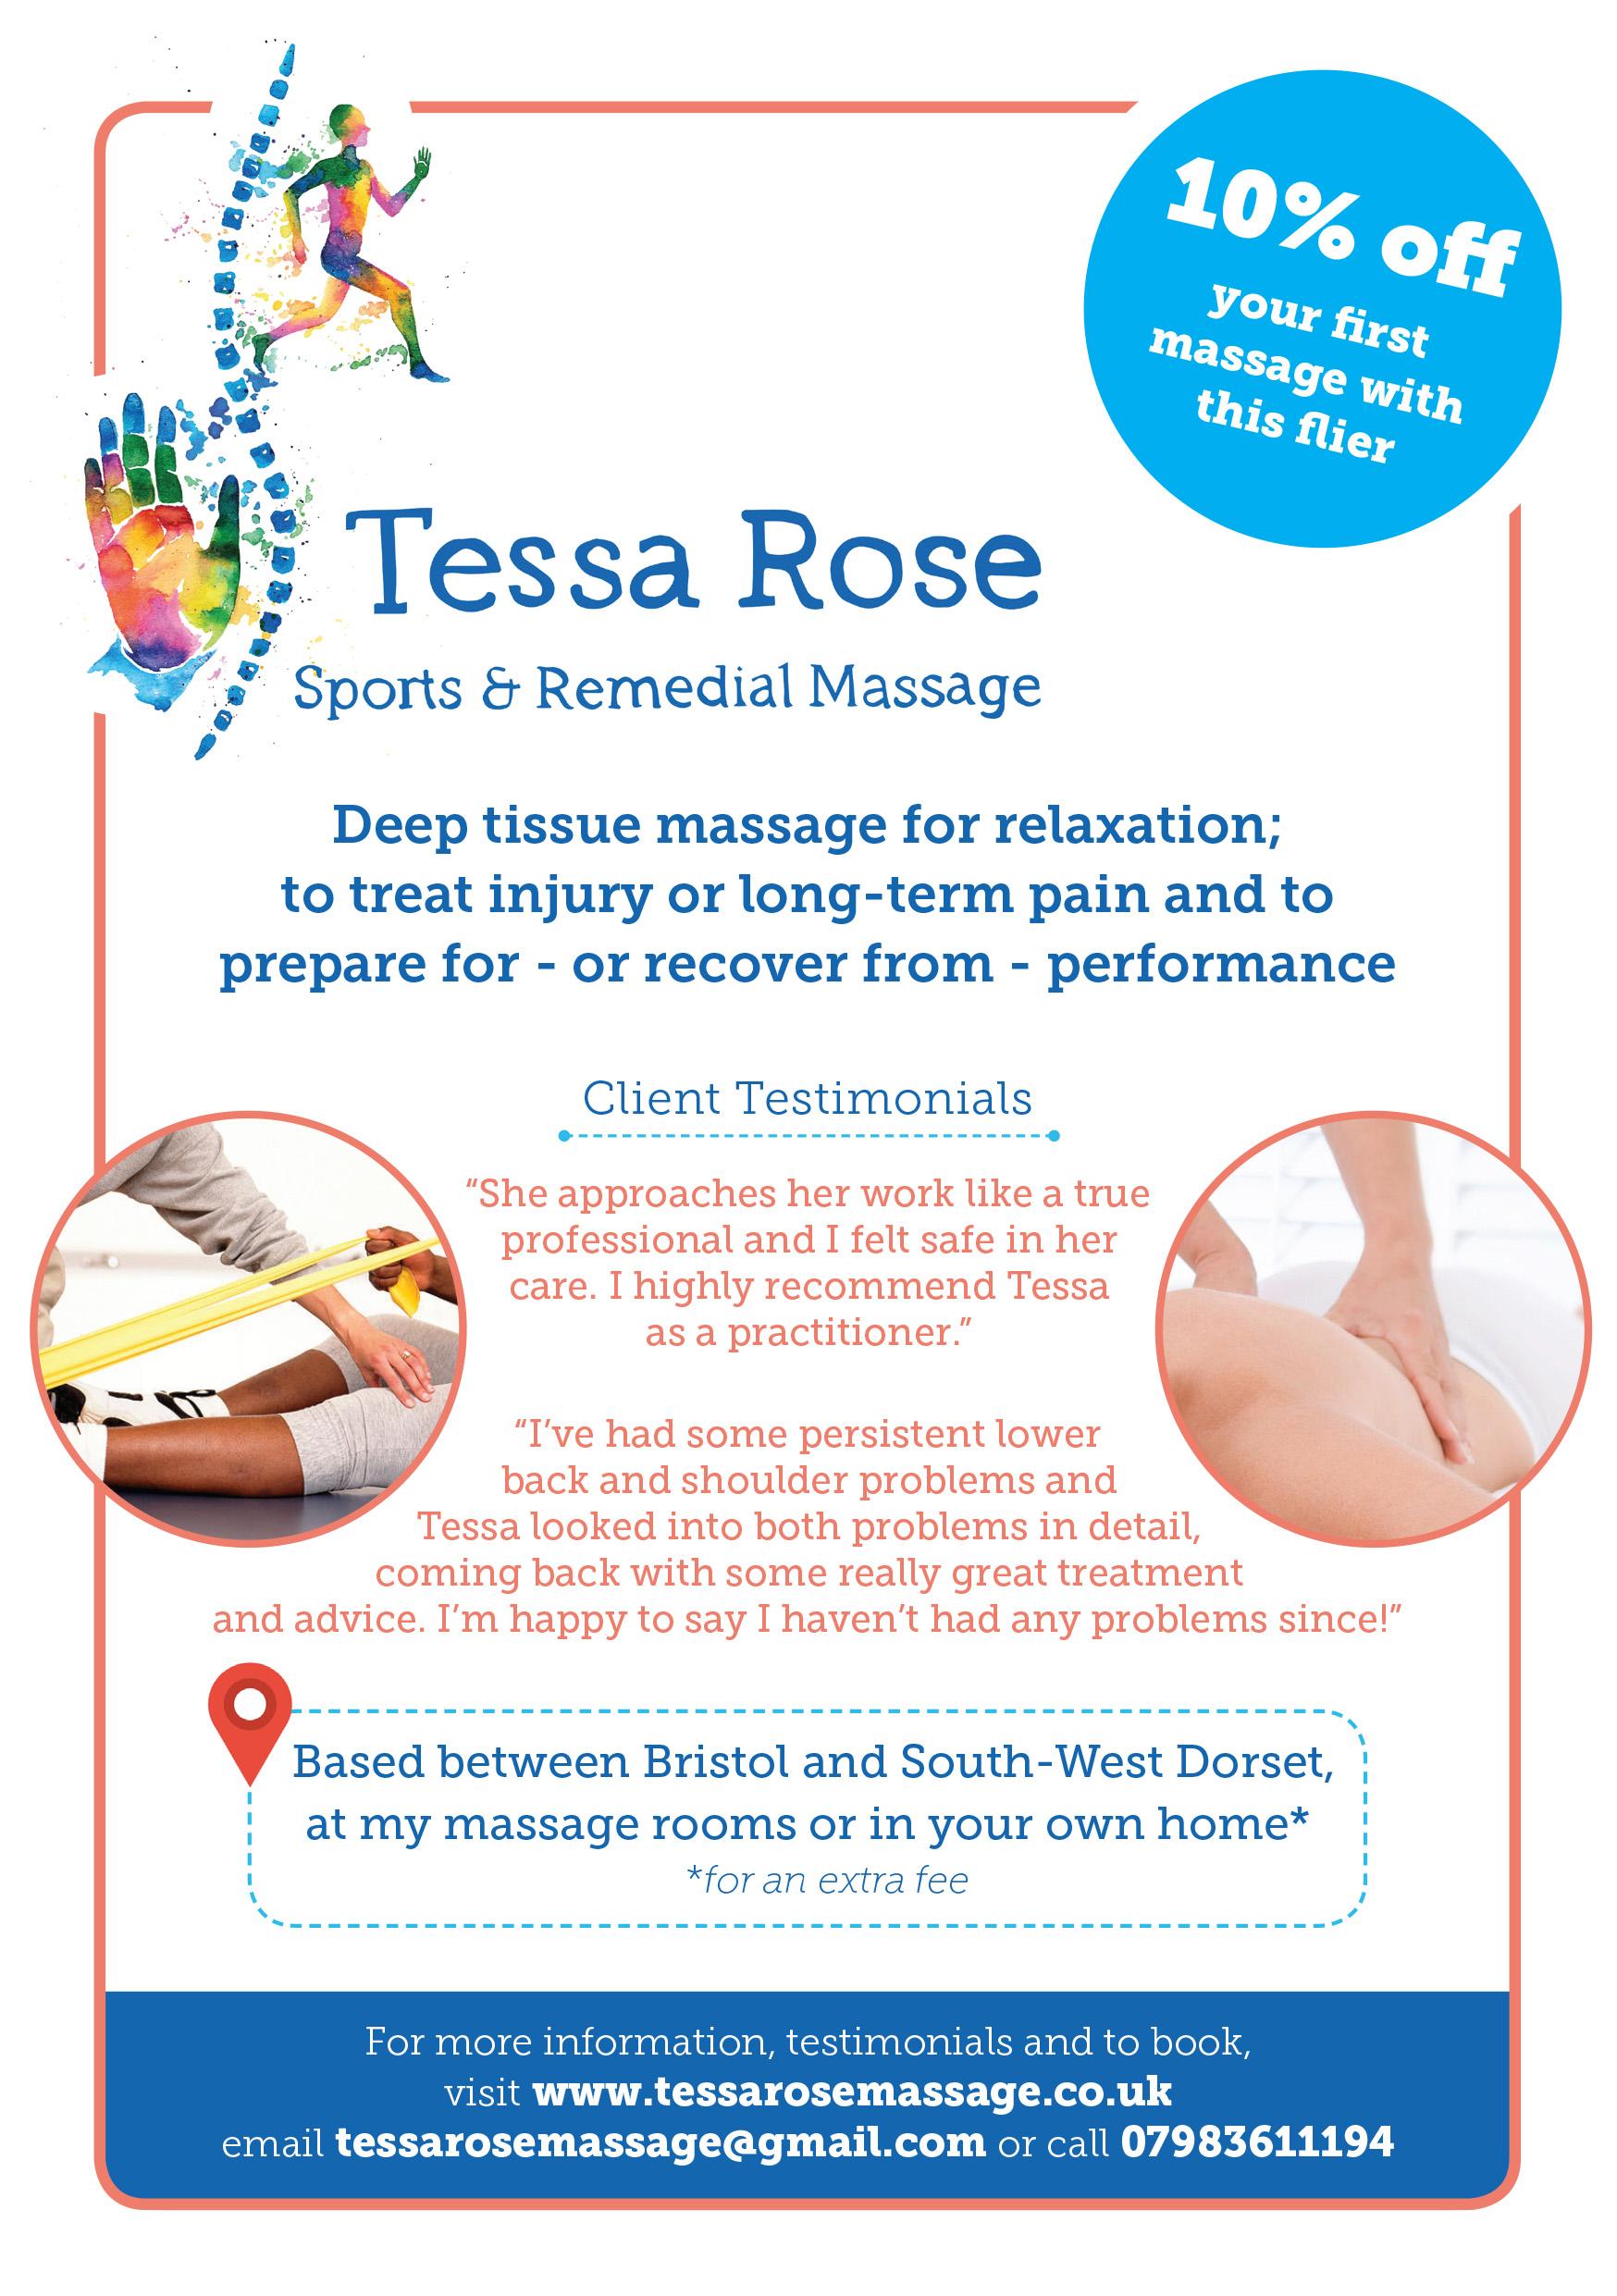 TessaRose flyer final for print.jpg